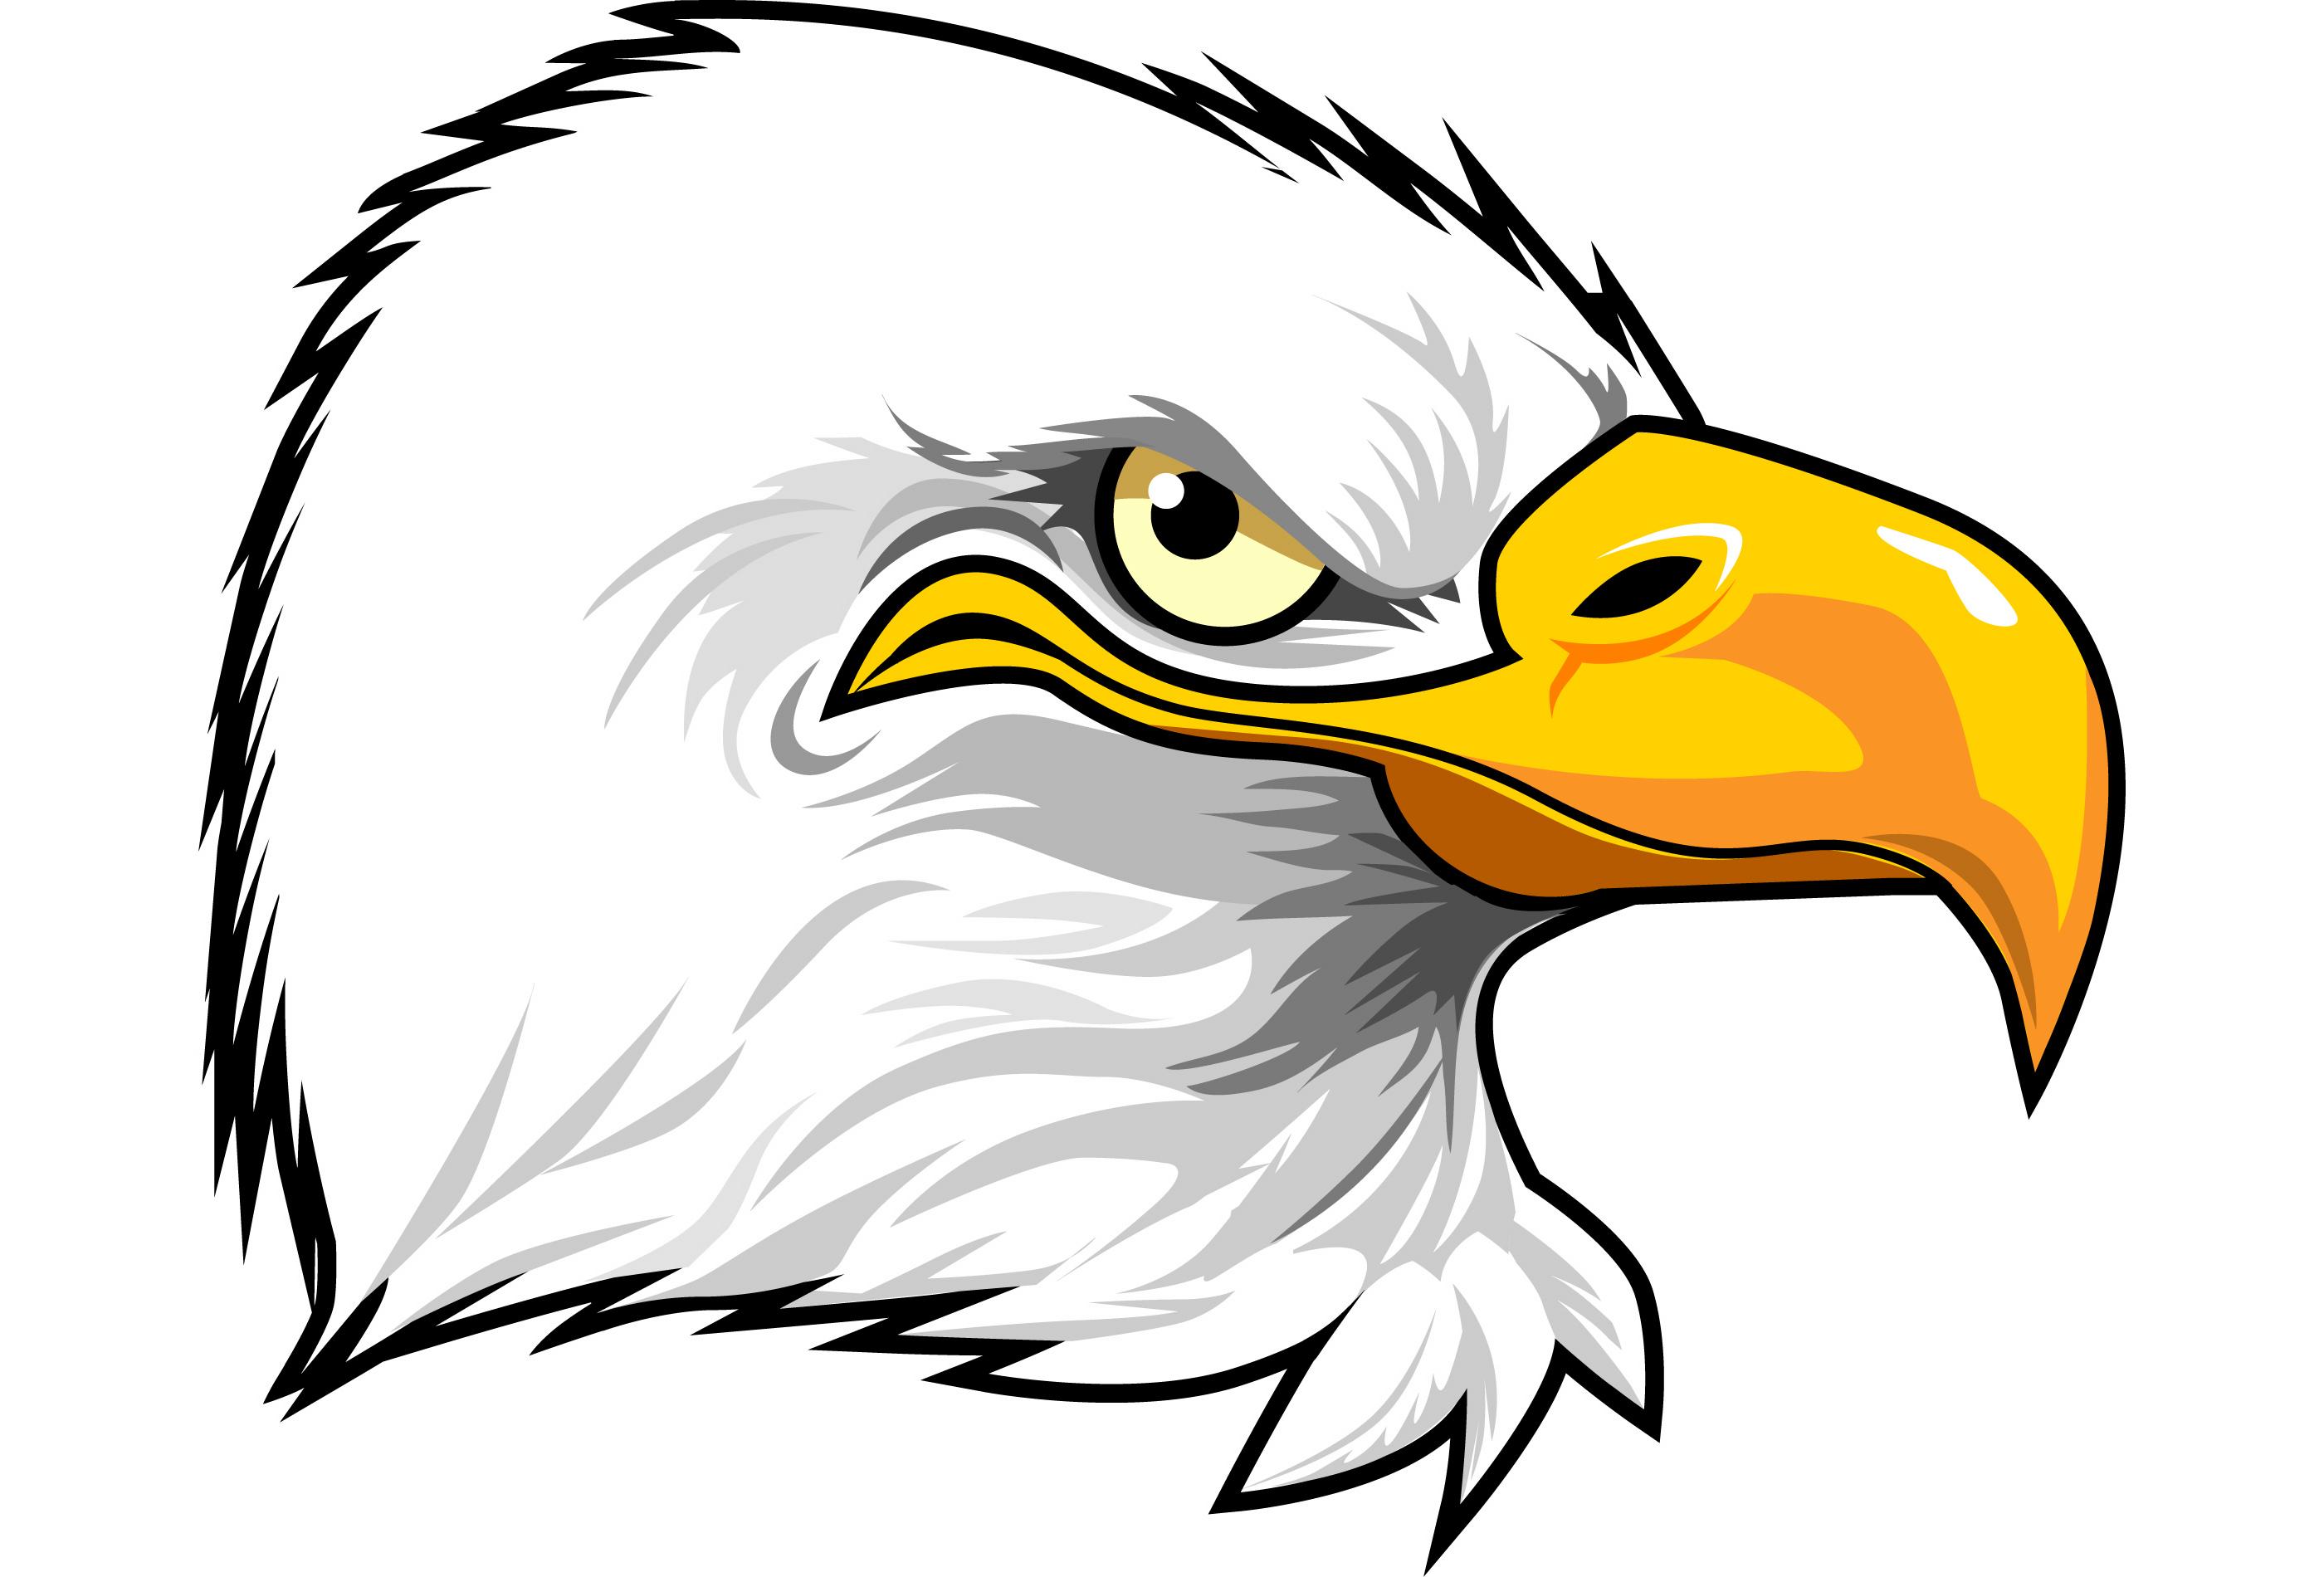 2800x1900 Cartoon Eagle Drawing Drawn Eagle Cartoon